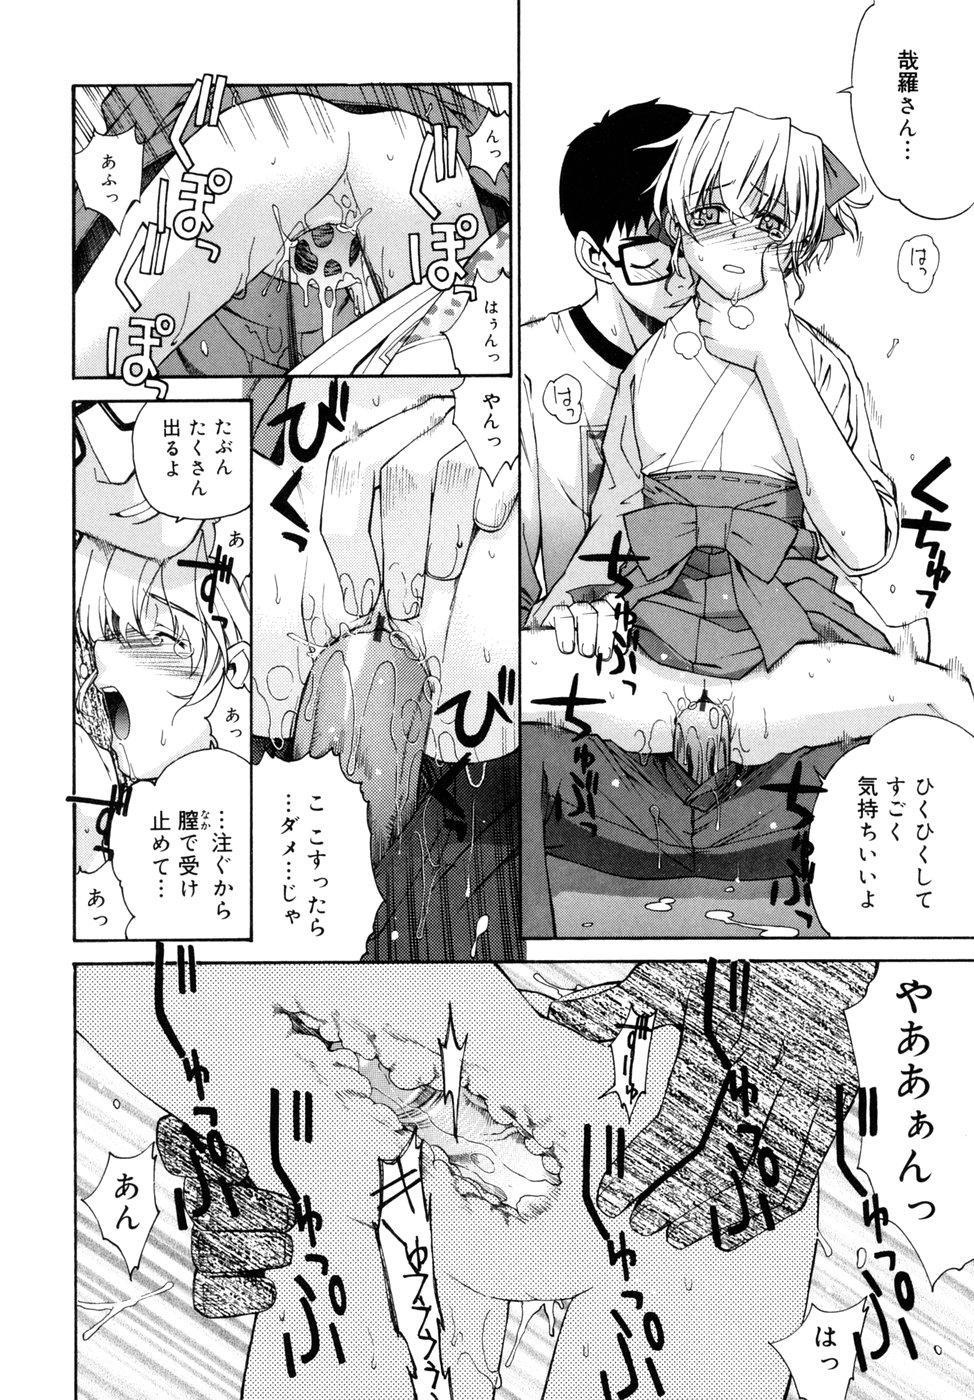 [Yaya Hinata] Tonari no Miko-san wa Minna Warau - The next shrine maidens smile in everyone. 137